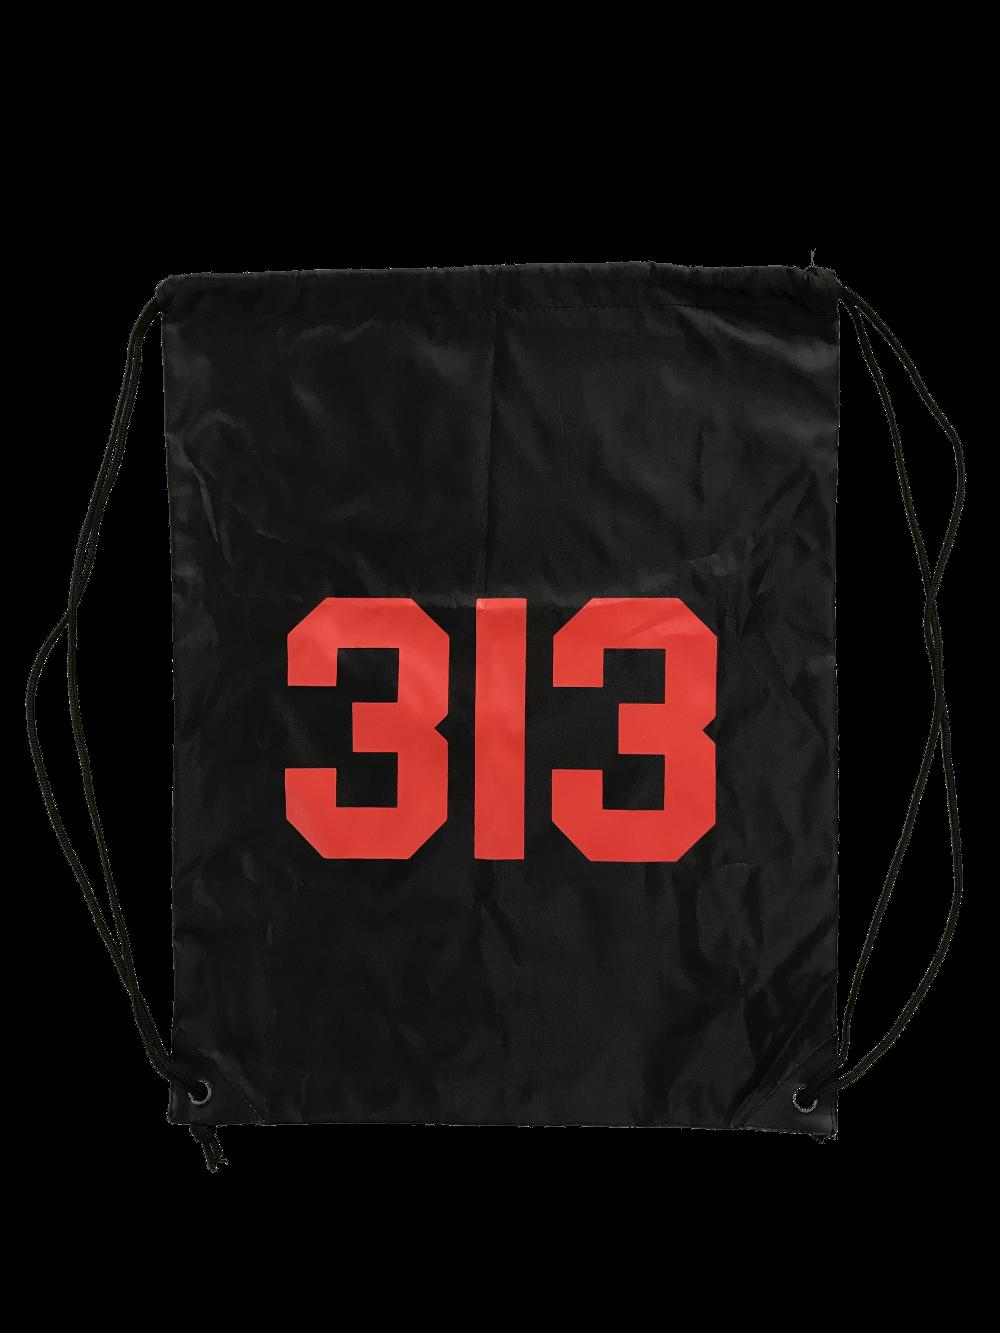 313 Gympapåse